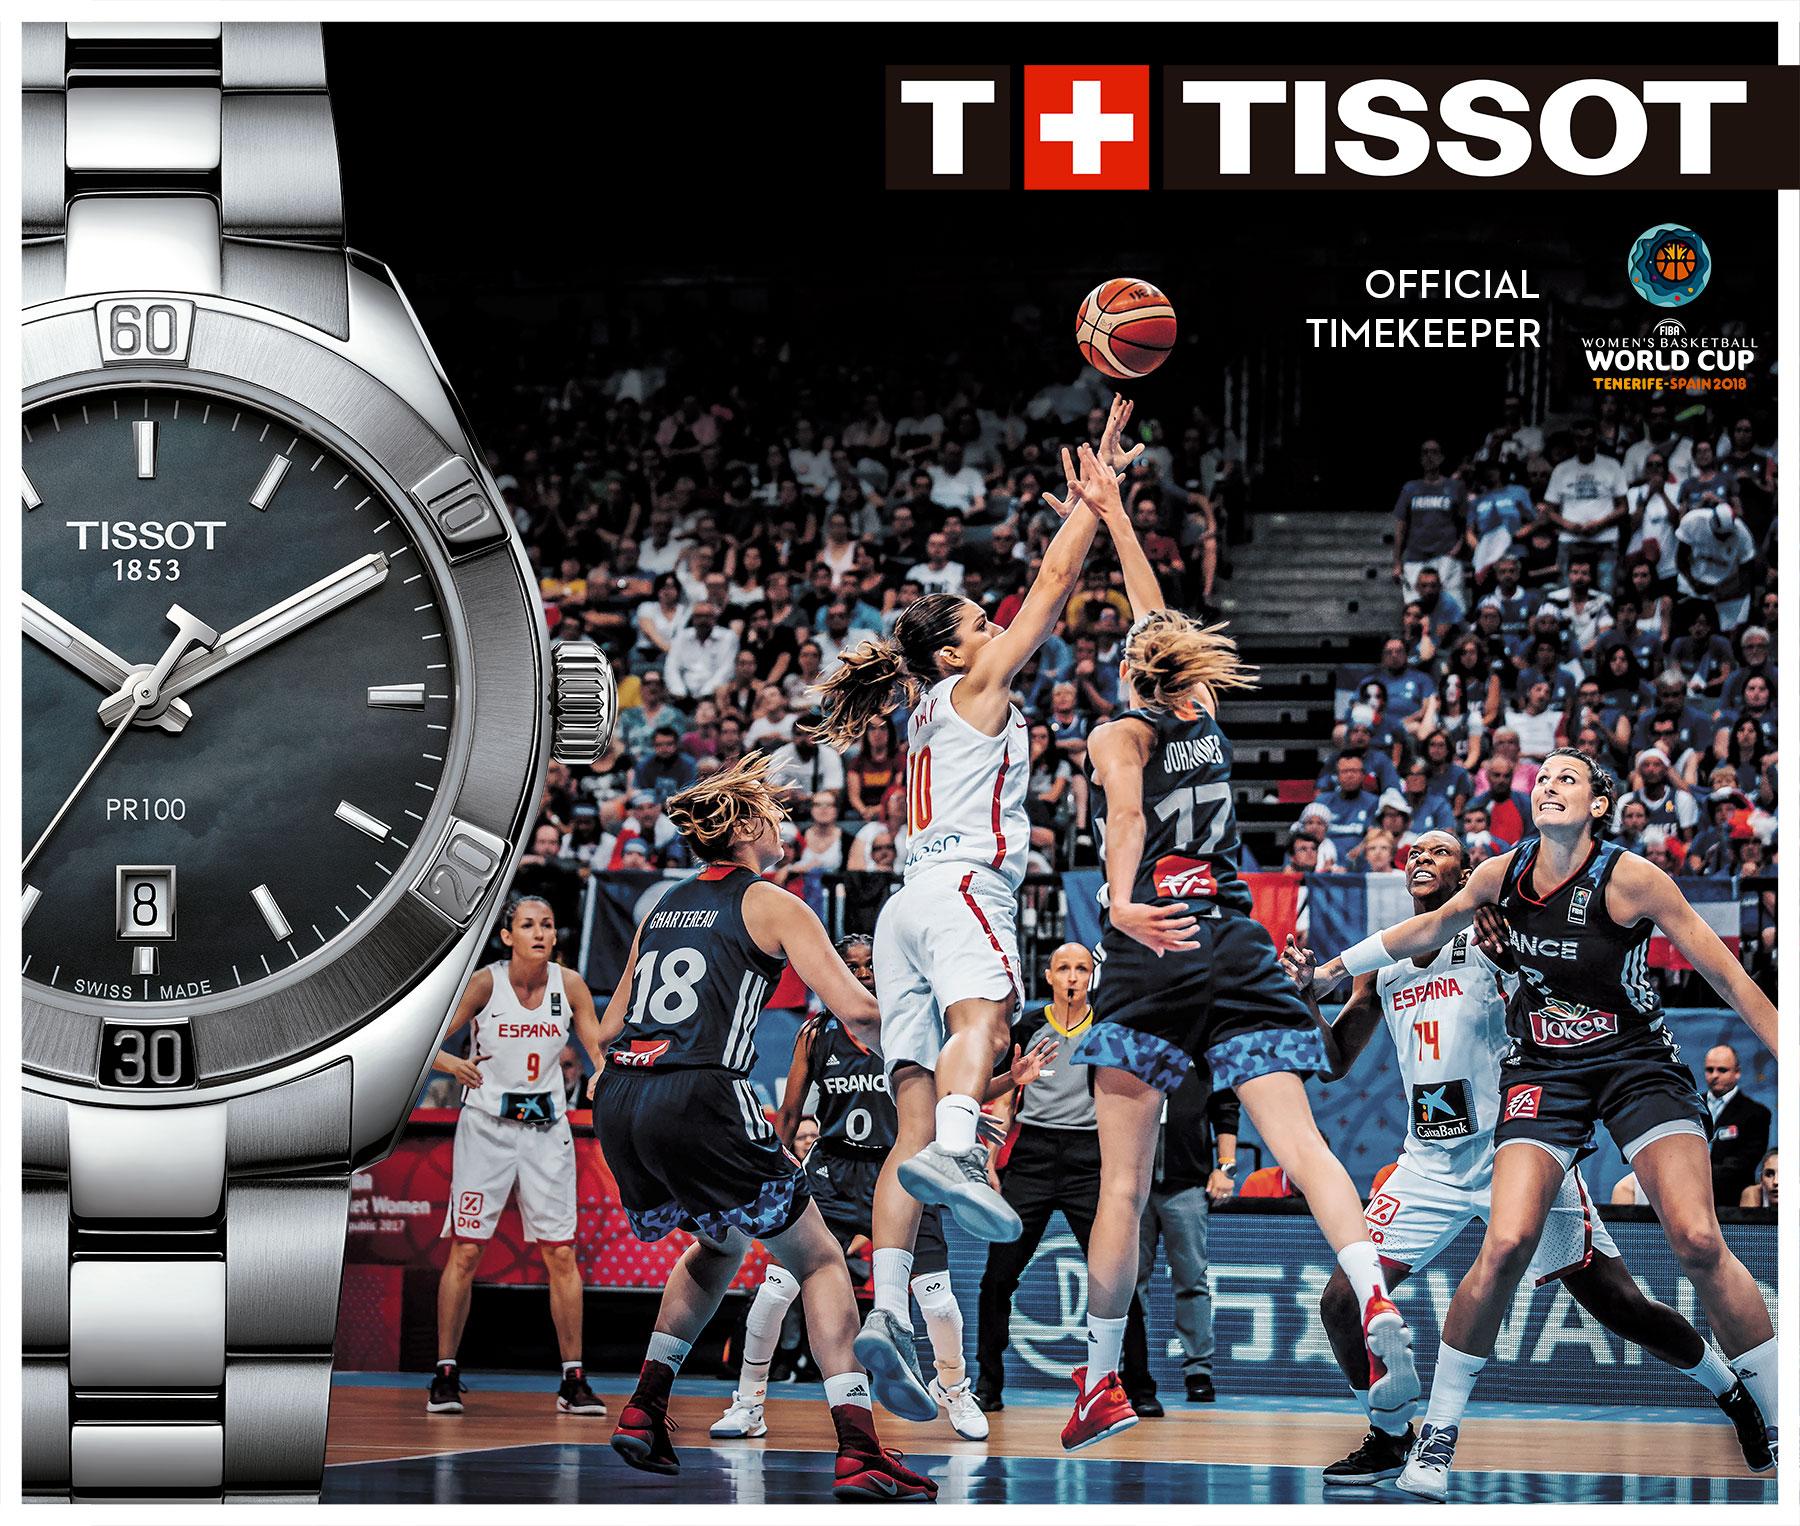 Arranca La Copa Mundial de Baloncesto Femenino 2018  con Tissot como Cronometrador Oficial